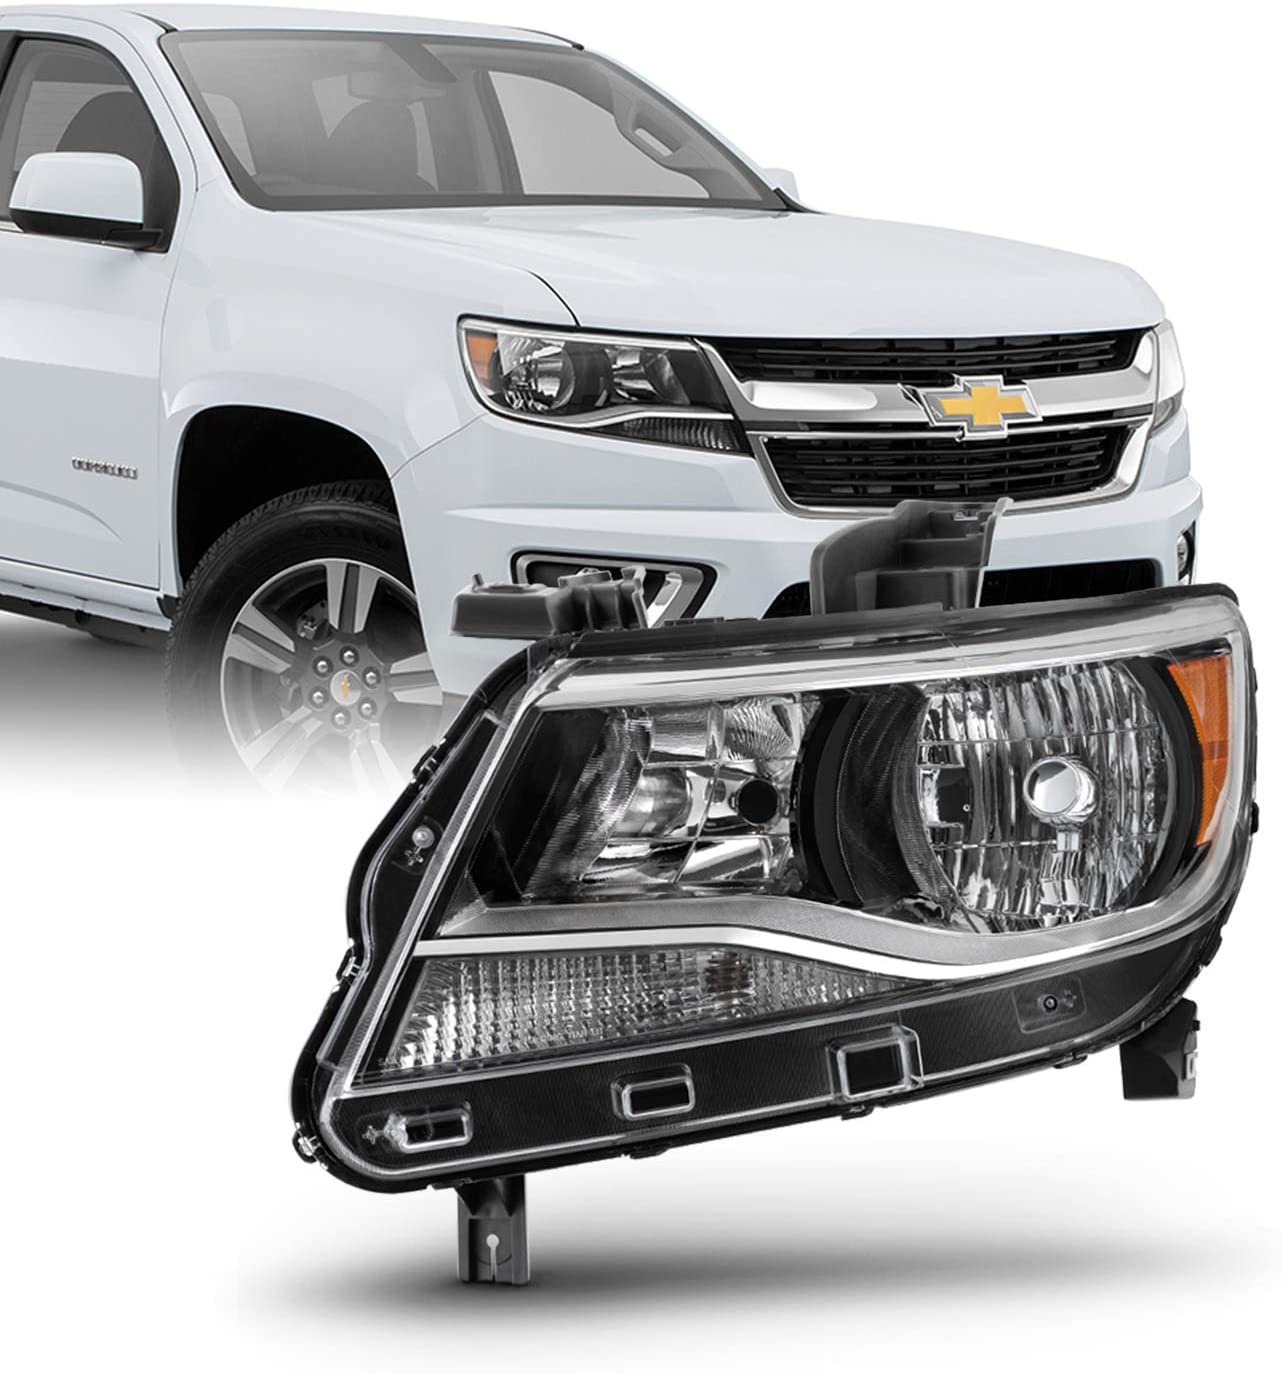 Black Headlight [Halogen Type] Fits 2015-2020 Chevy Colorado Driver Left Headlamp Replacement 15 16 17 18 19 20